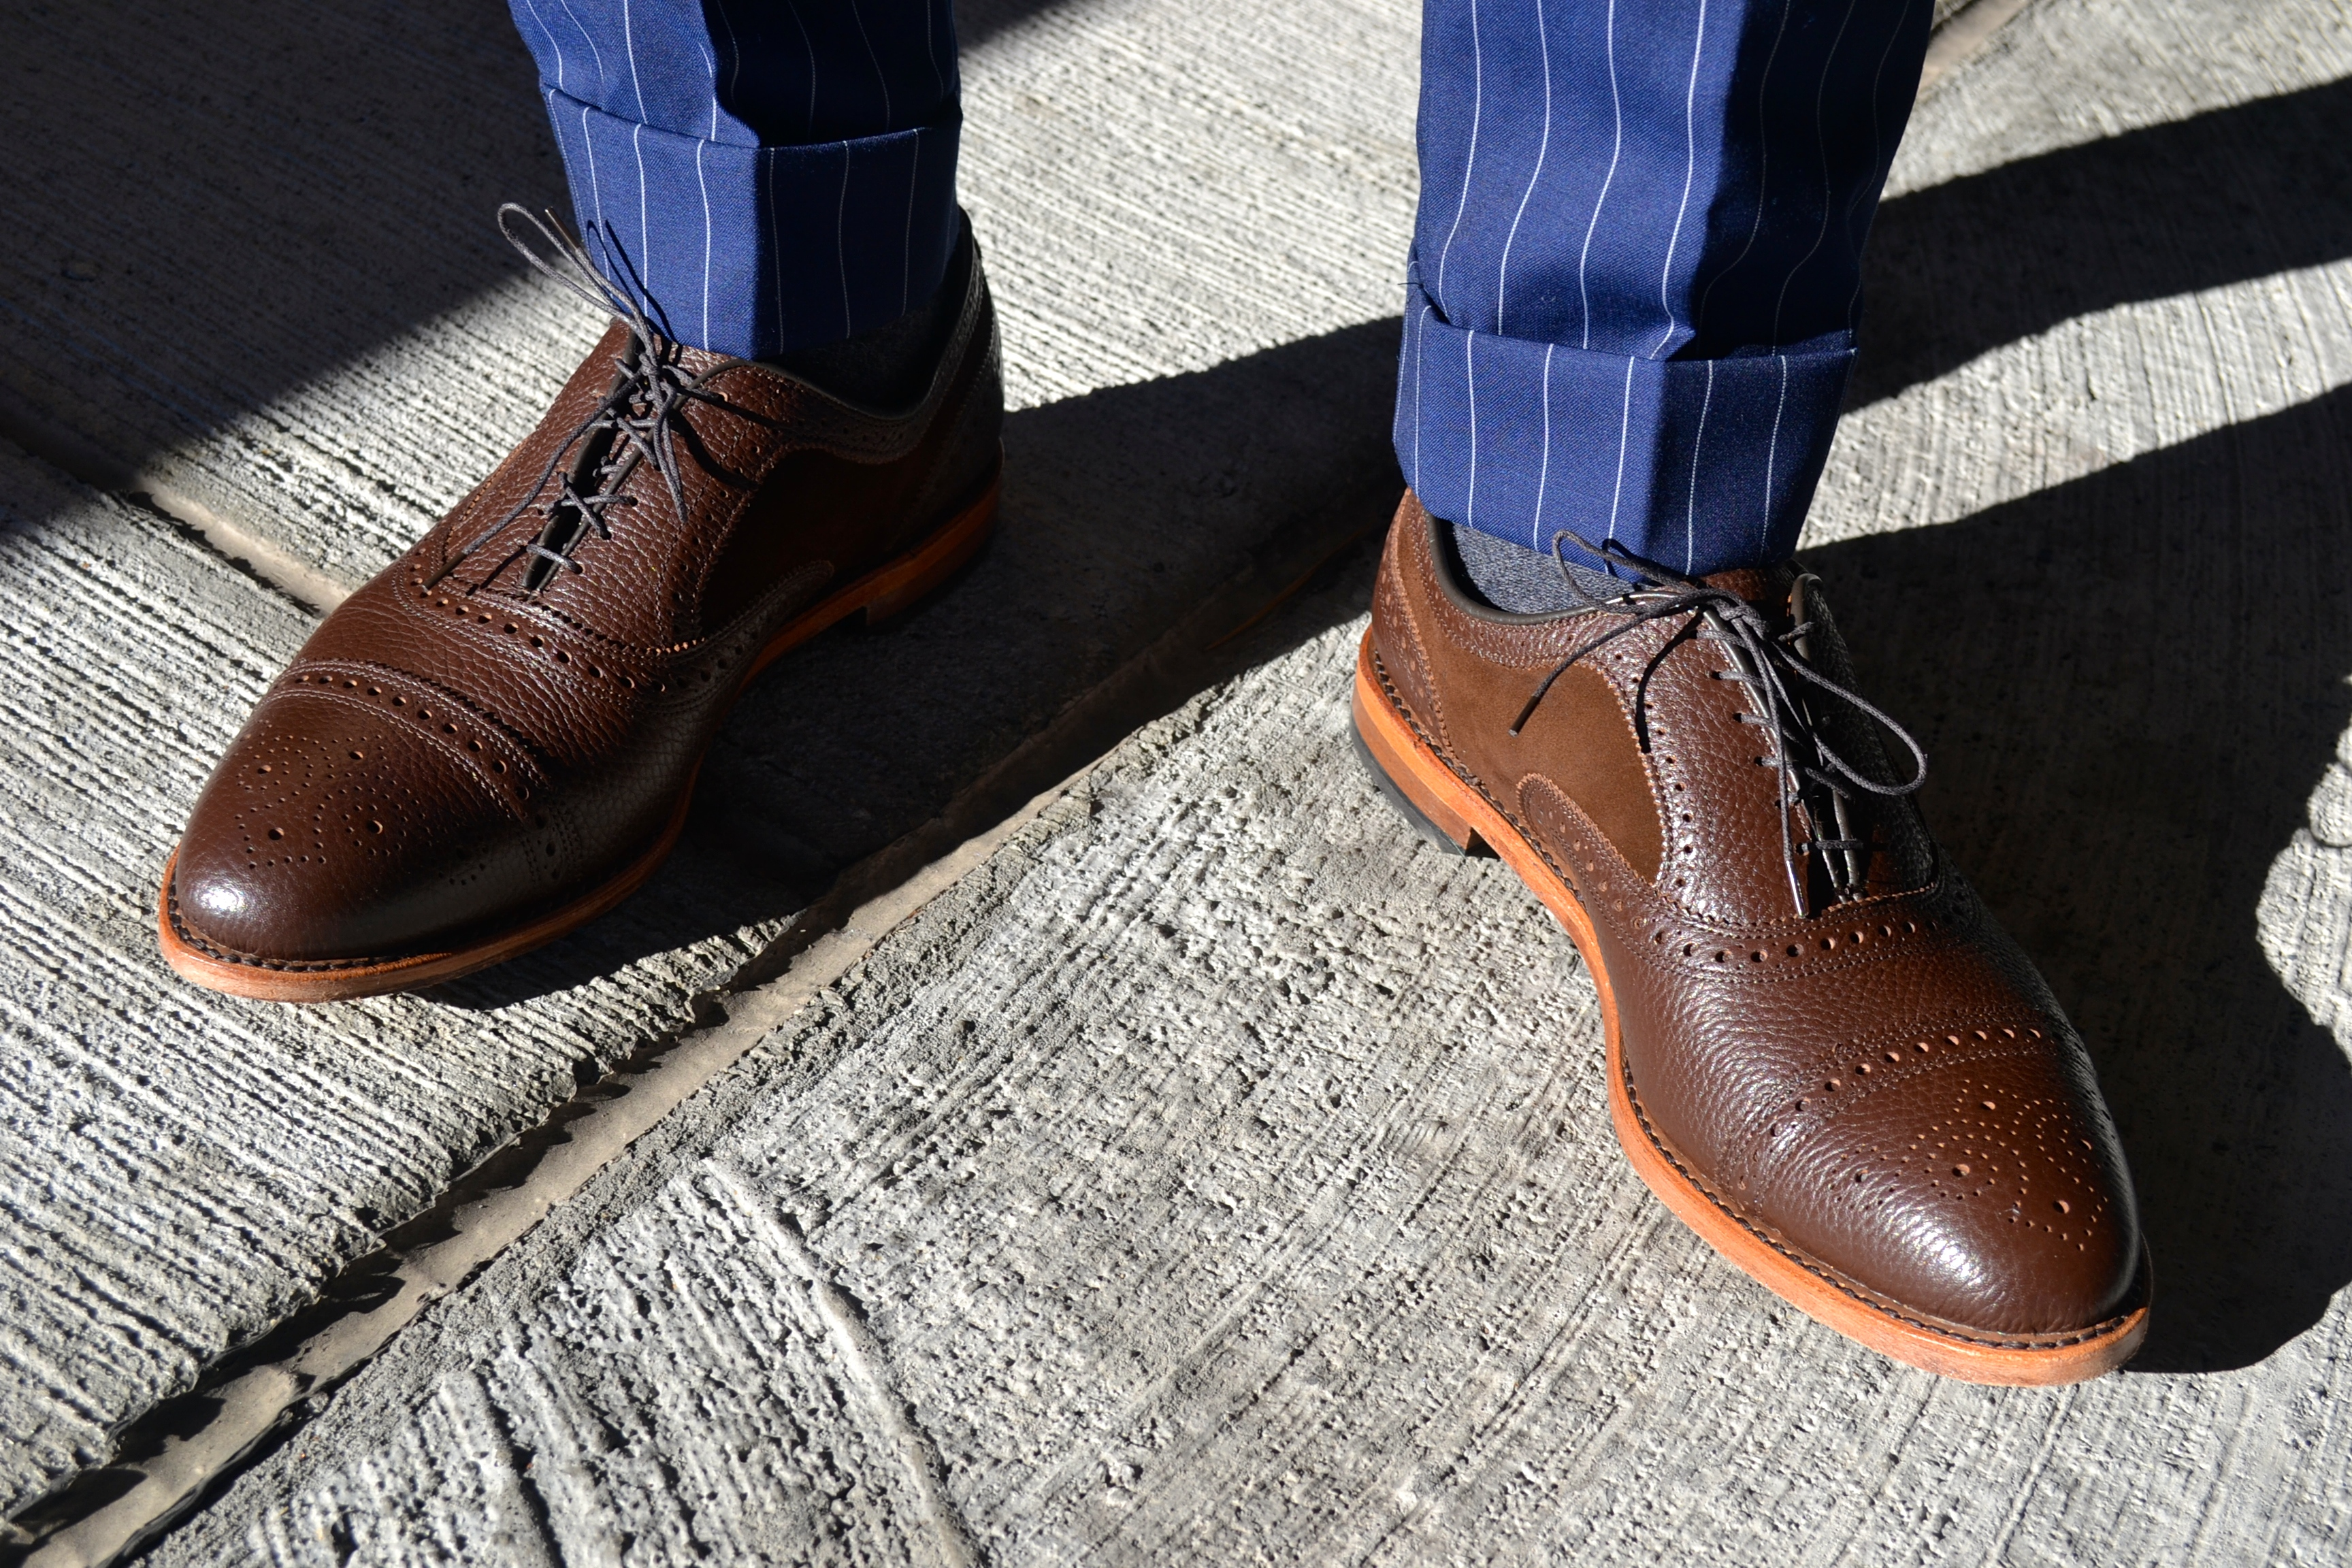 Men's Style Pro in Imparali Edinburgh Custom Chalk Stripe Suit and Allen Edmonds Custom Shoes